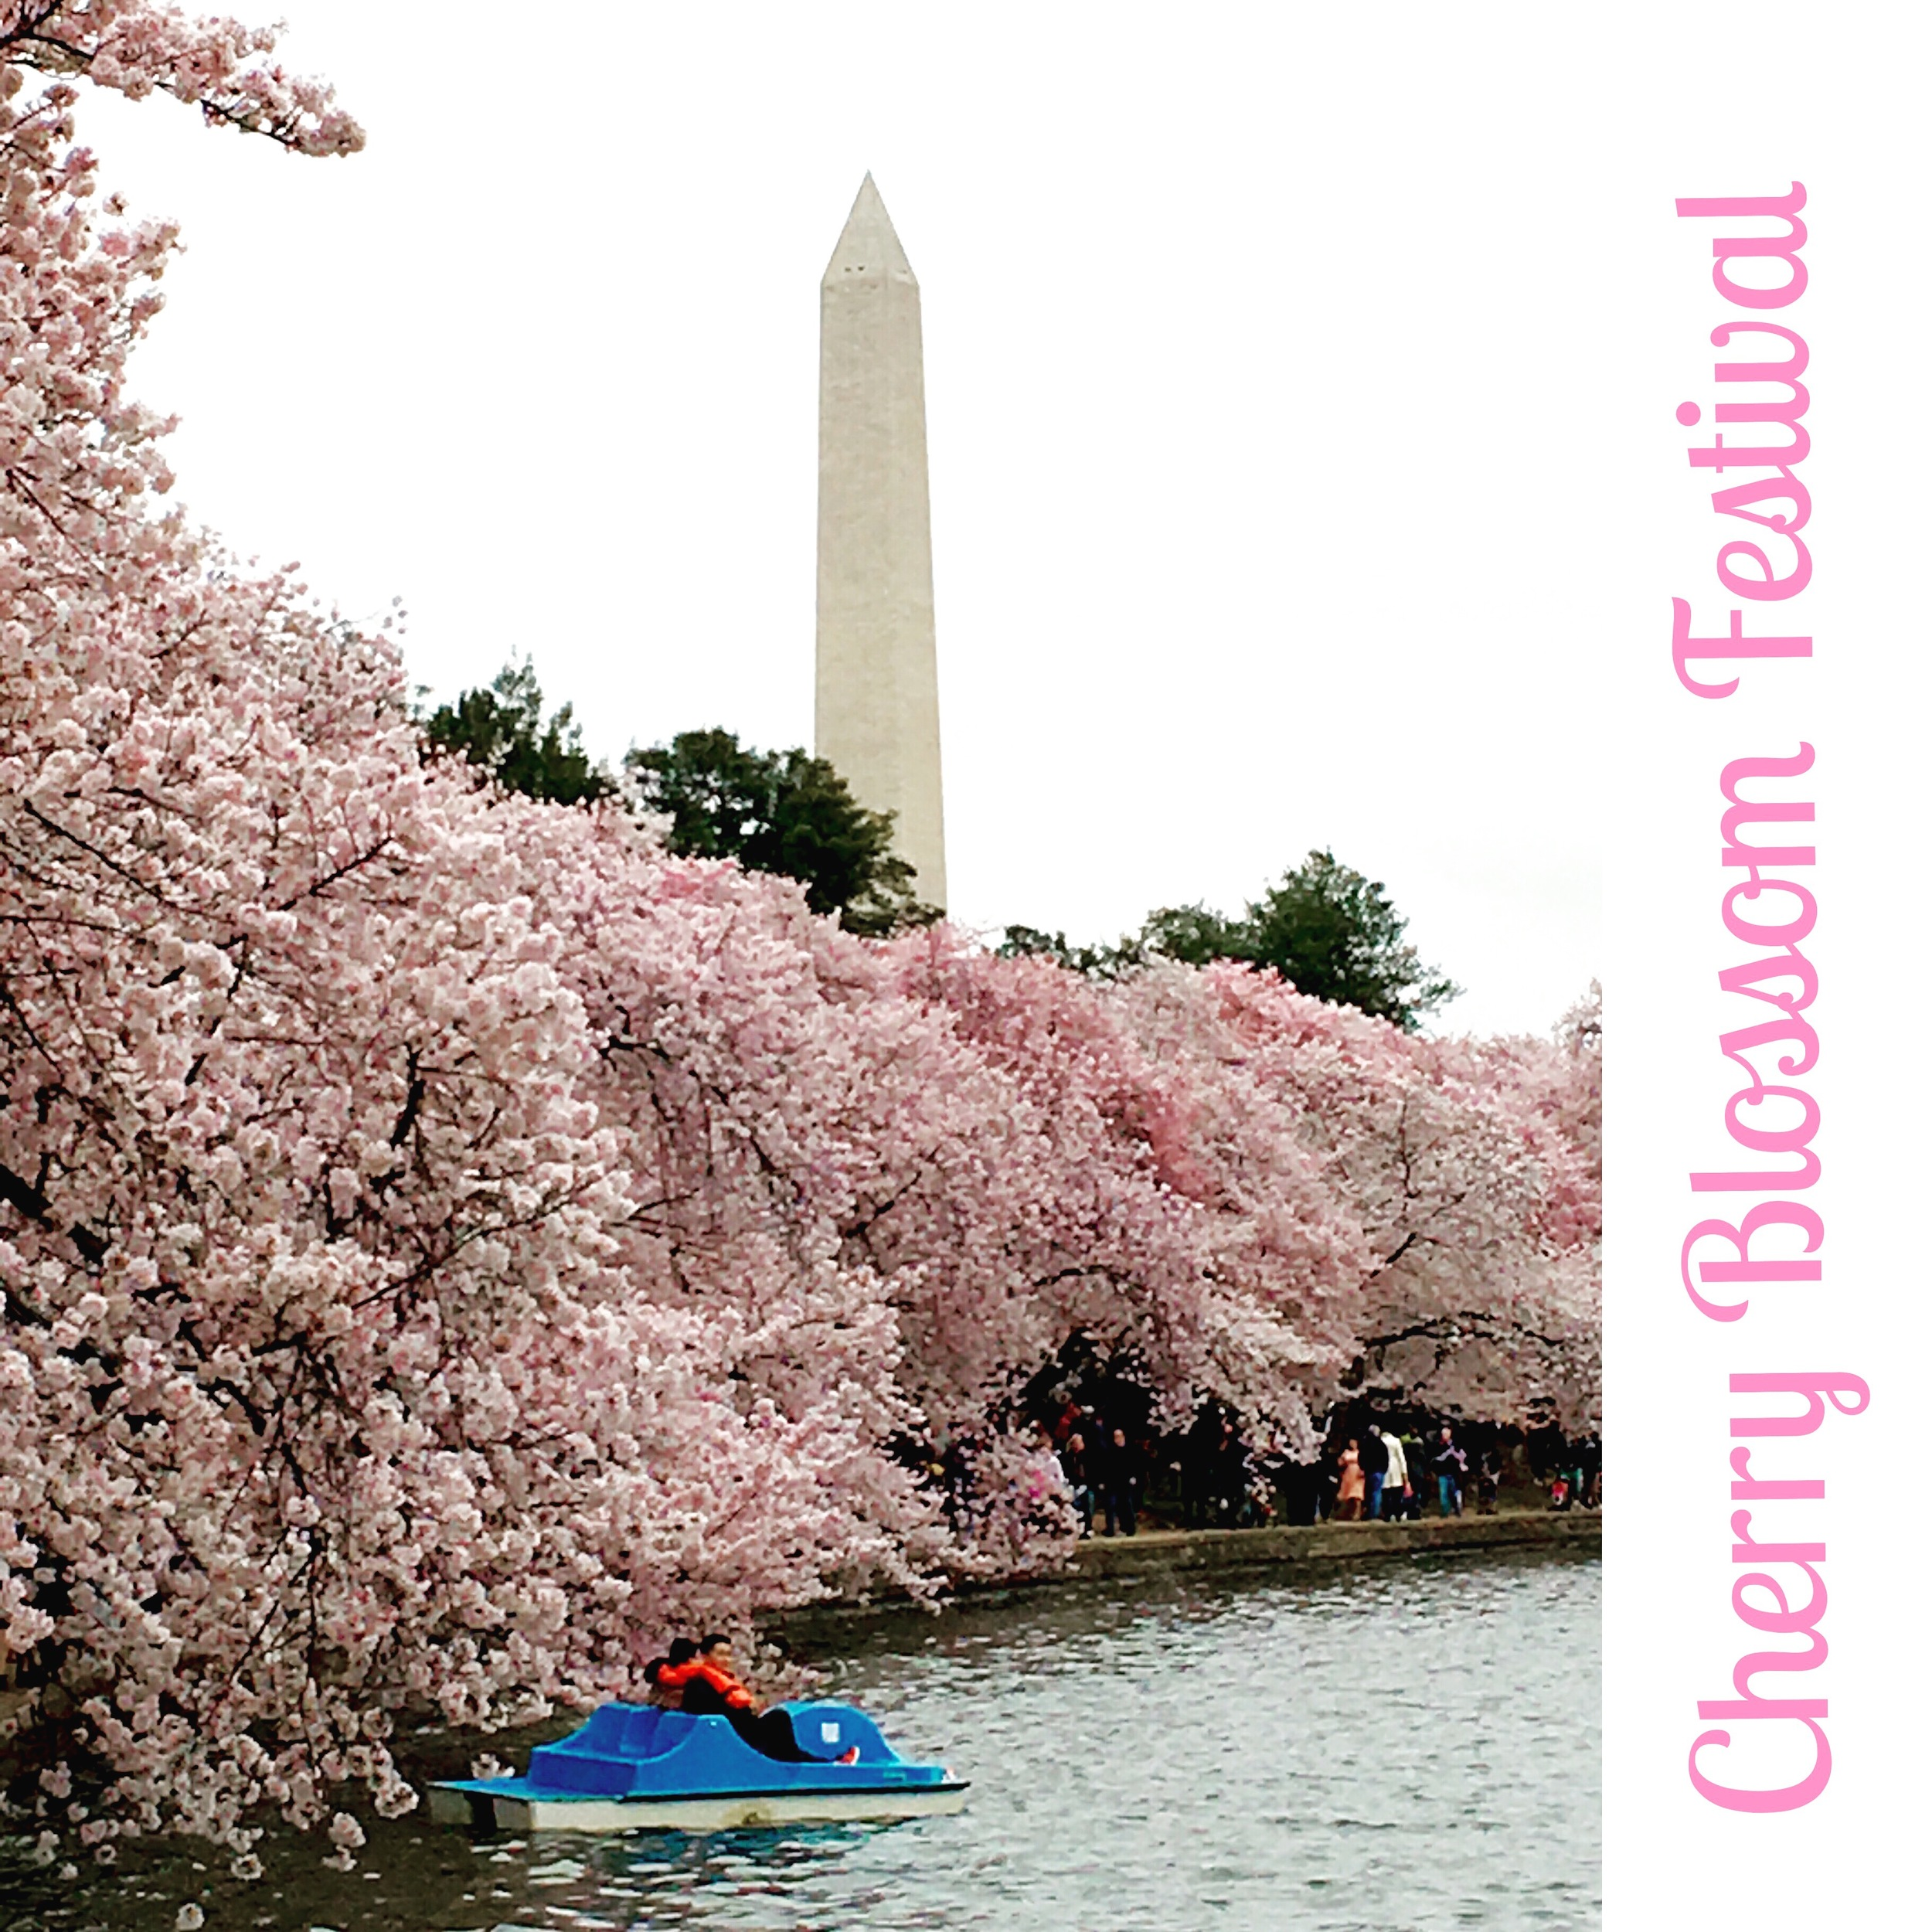 washington-dc-cherry-blossoms-a-peach-life